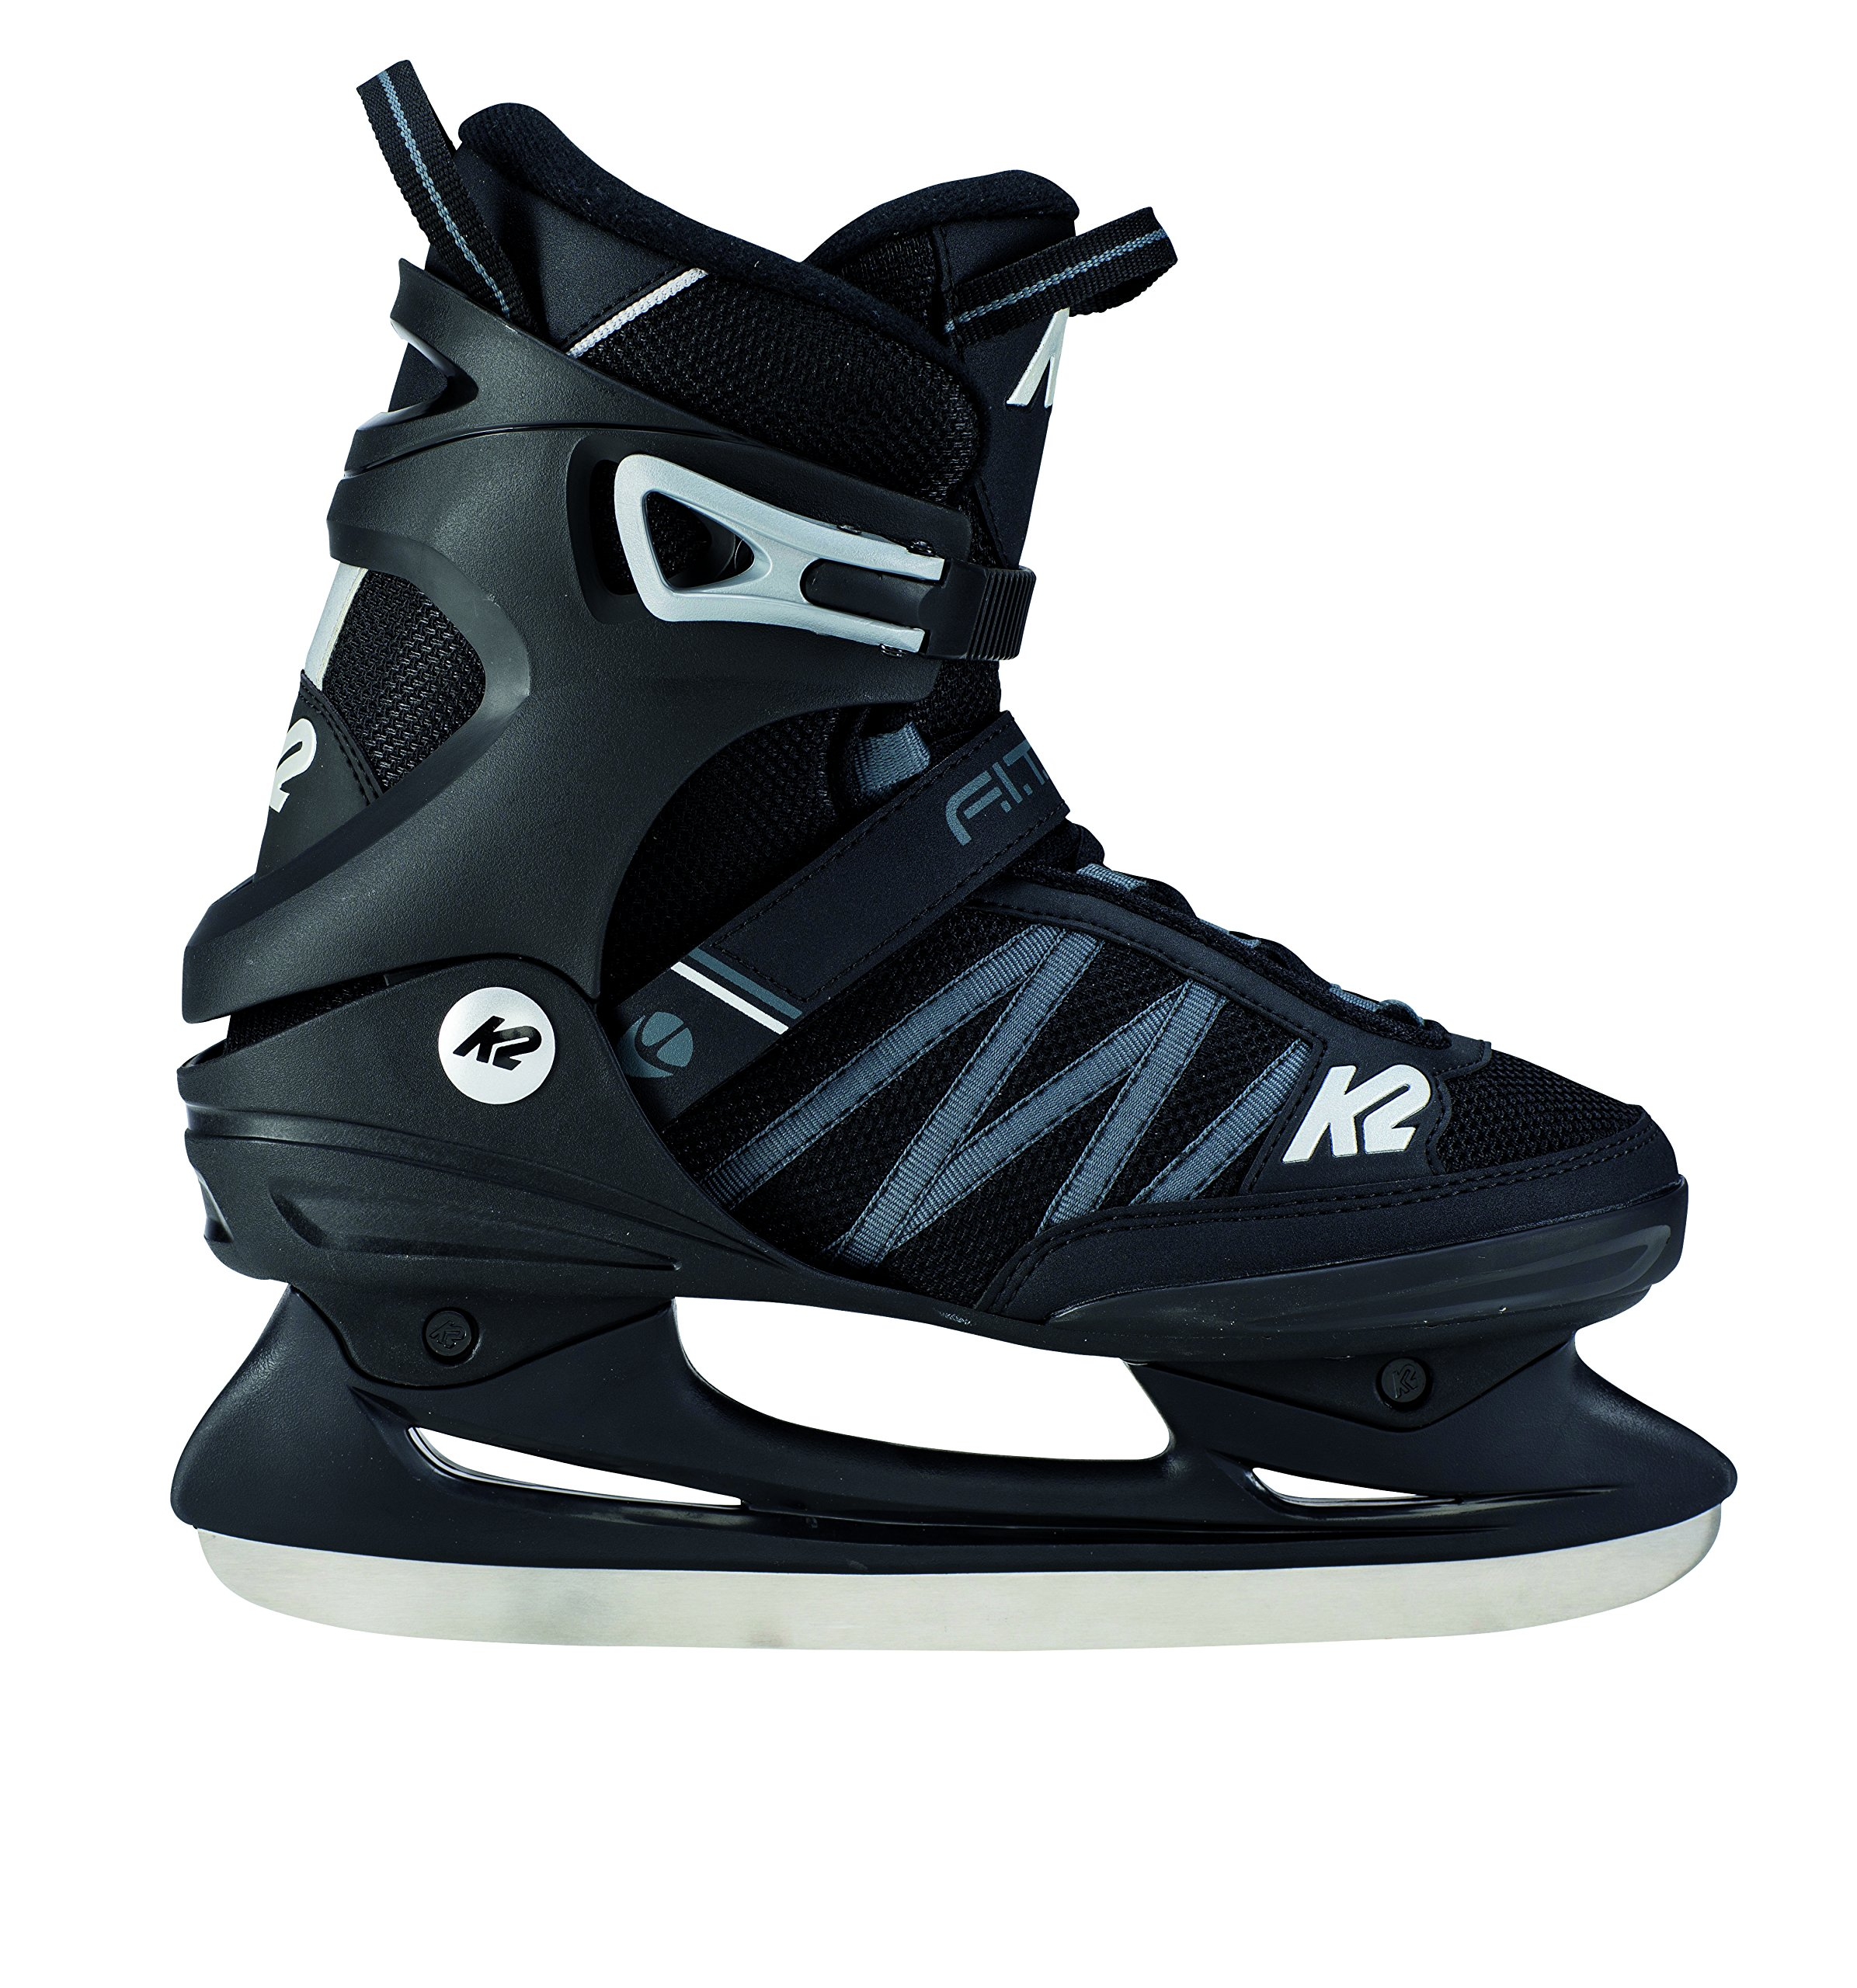 K2 Skate Men's F.I.T. Ice Skate, Black Gray, 12